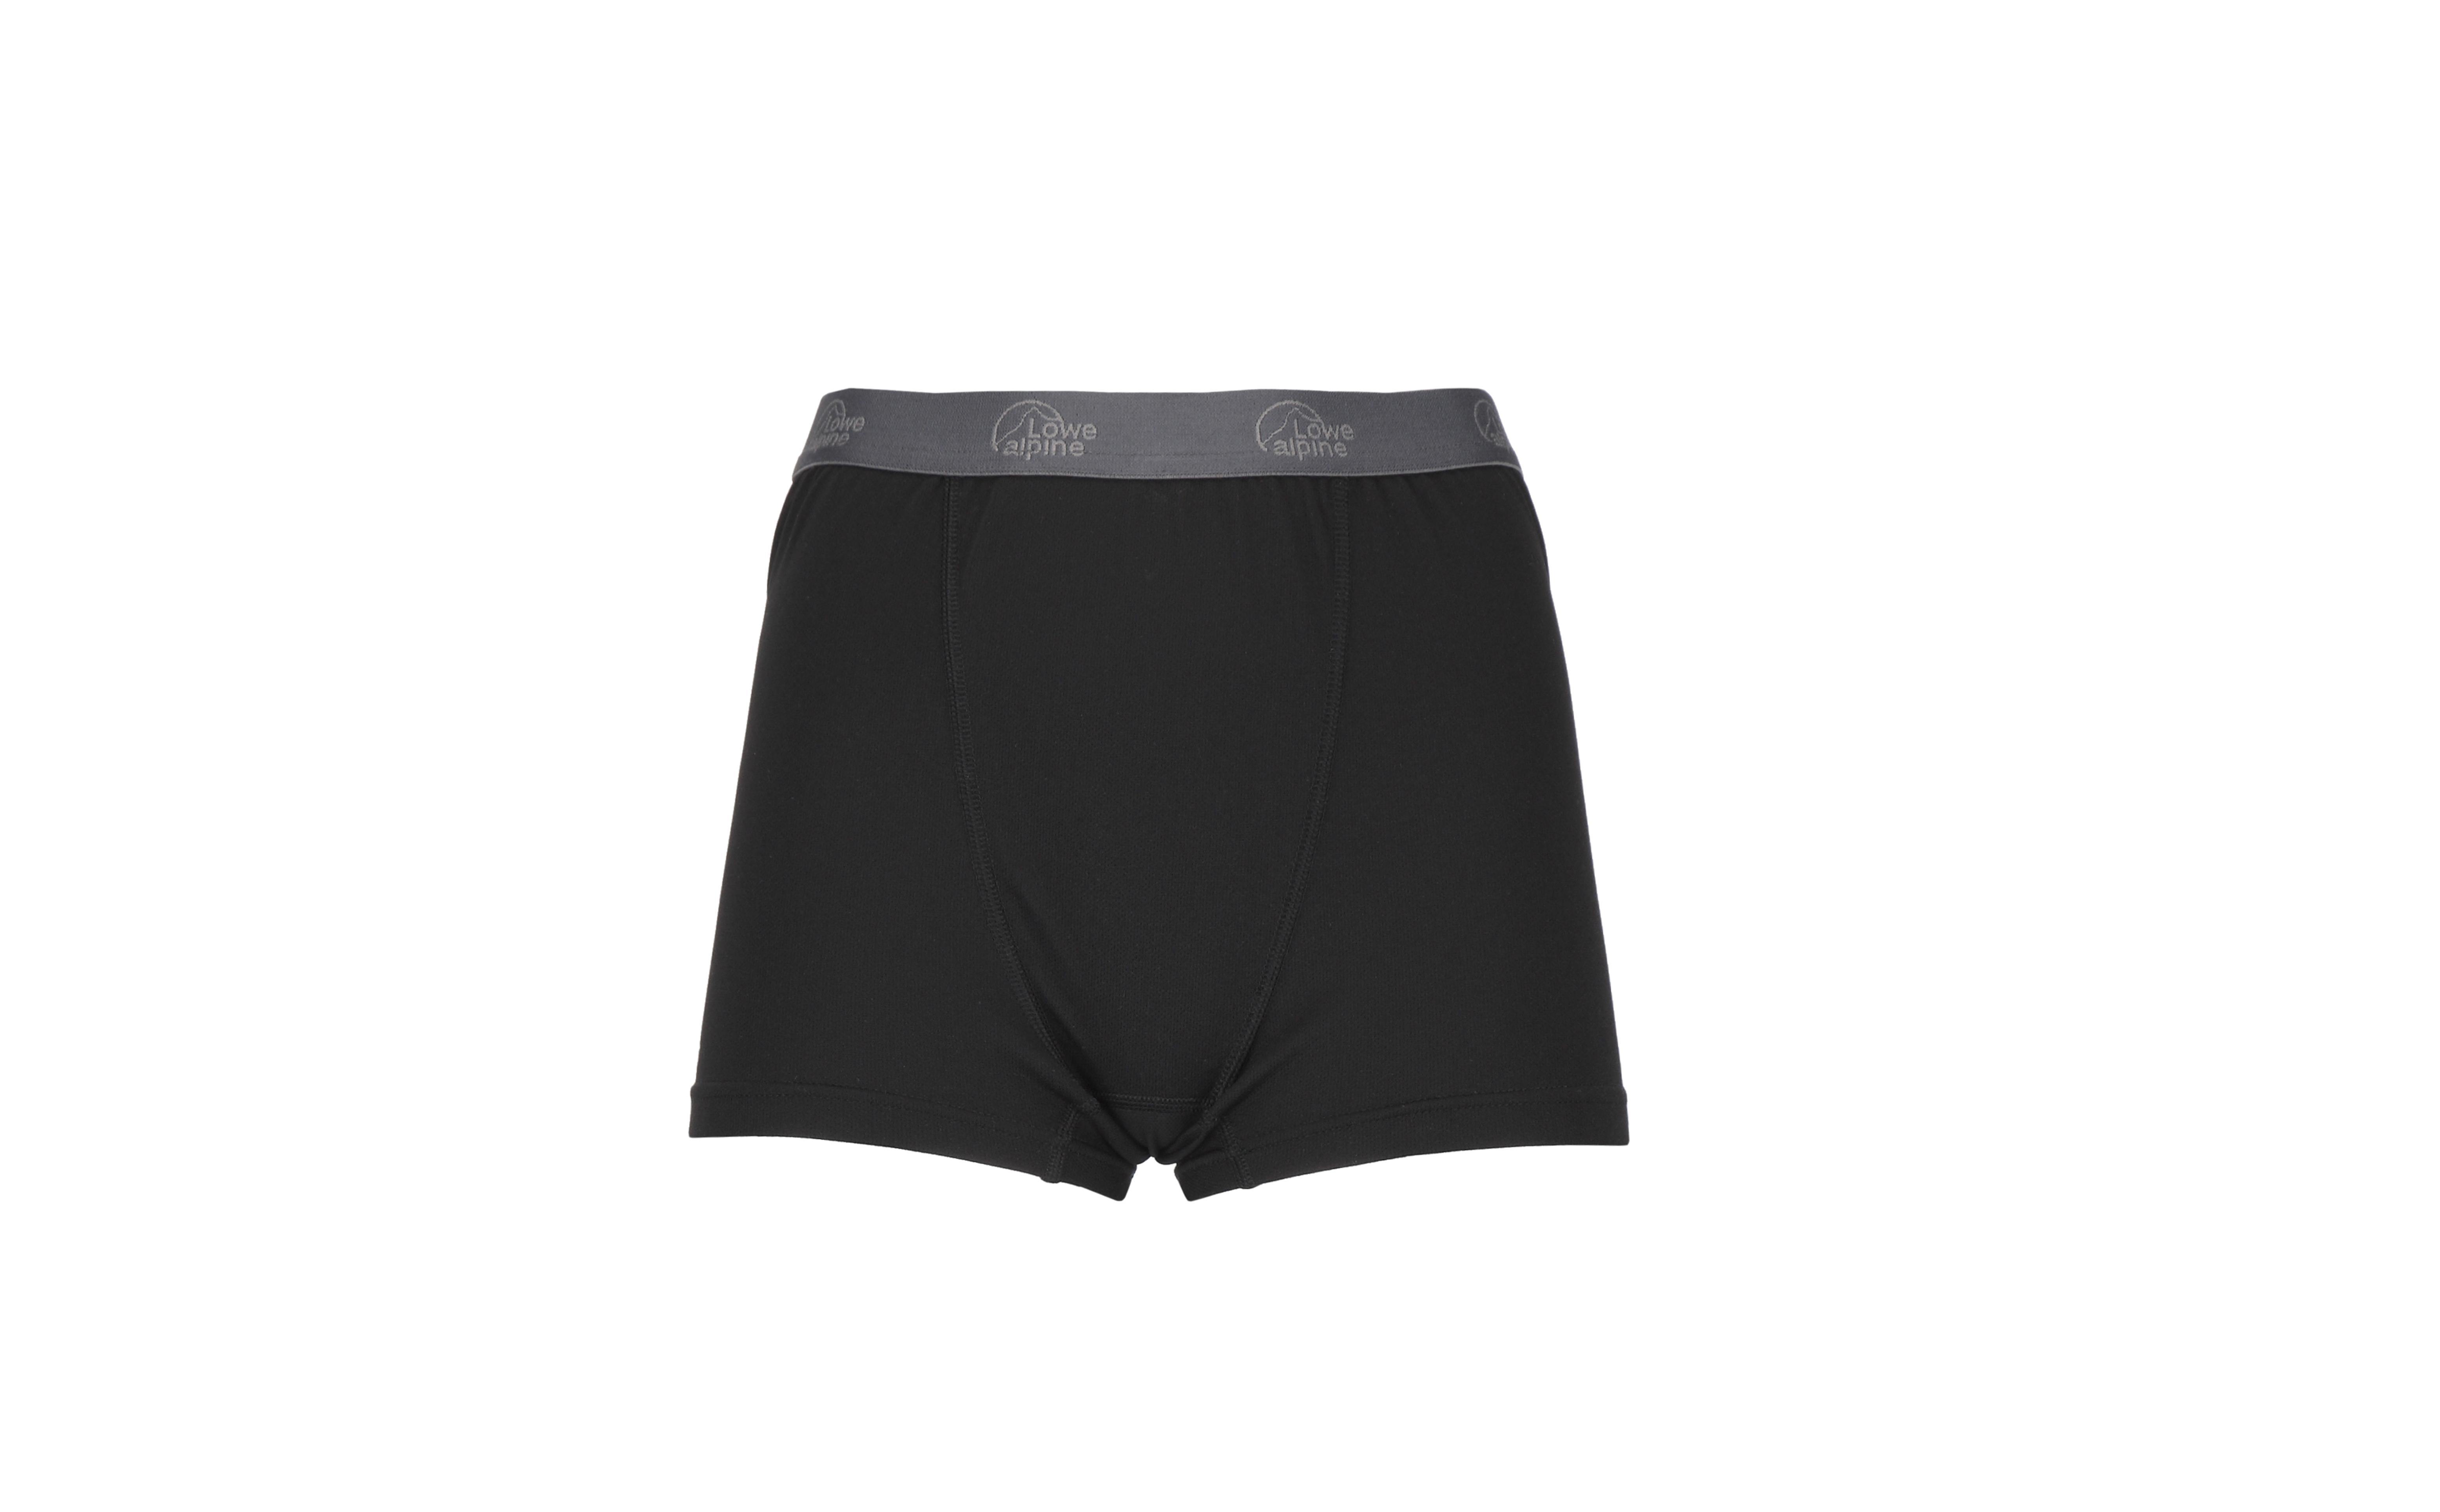 LOWE ALPINE Womens Black DryFlo Performance Base Layer Pants 120 Size UK 12 BNWT